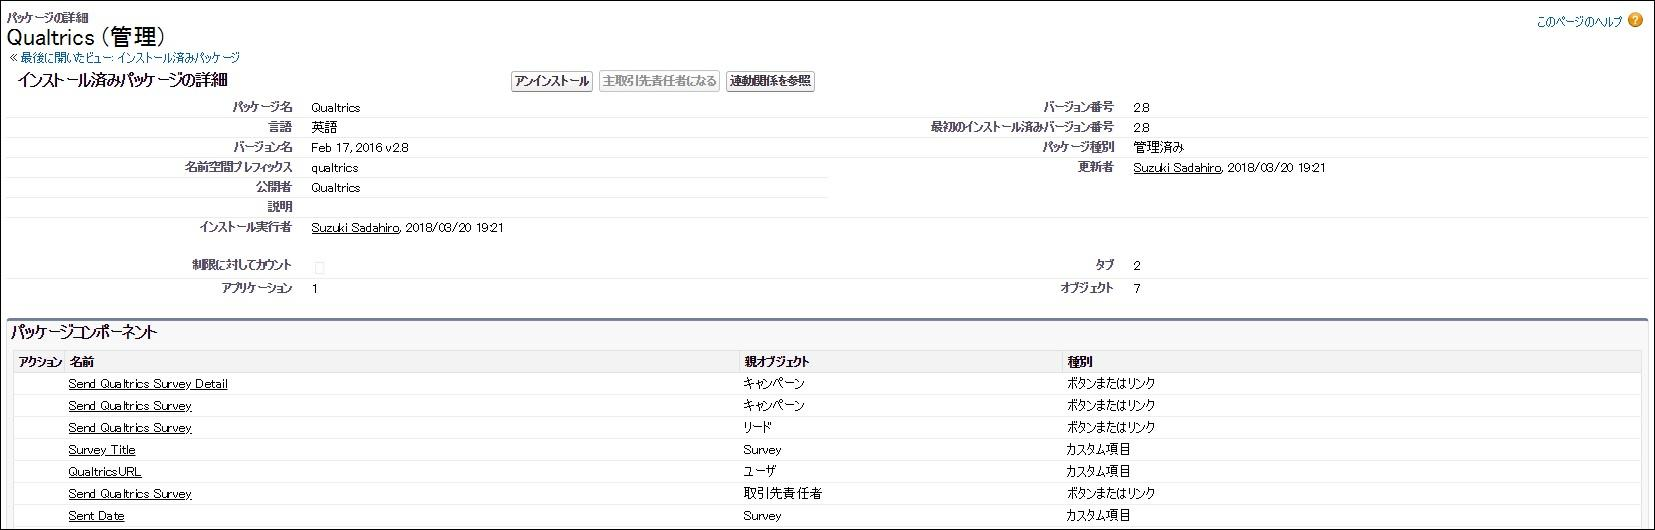 https://blogs.itmedia.co.jp/sadahiro29/No39/Pic39-8.jpg